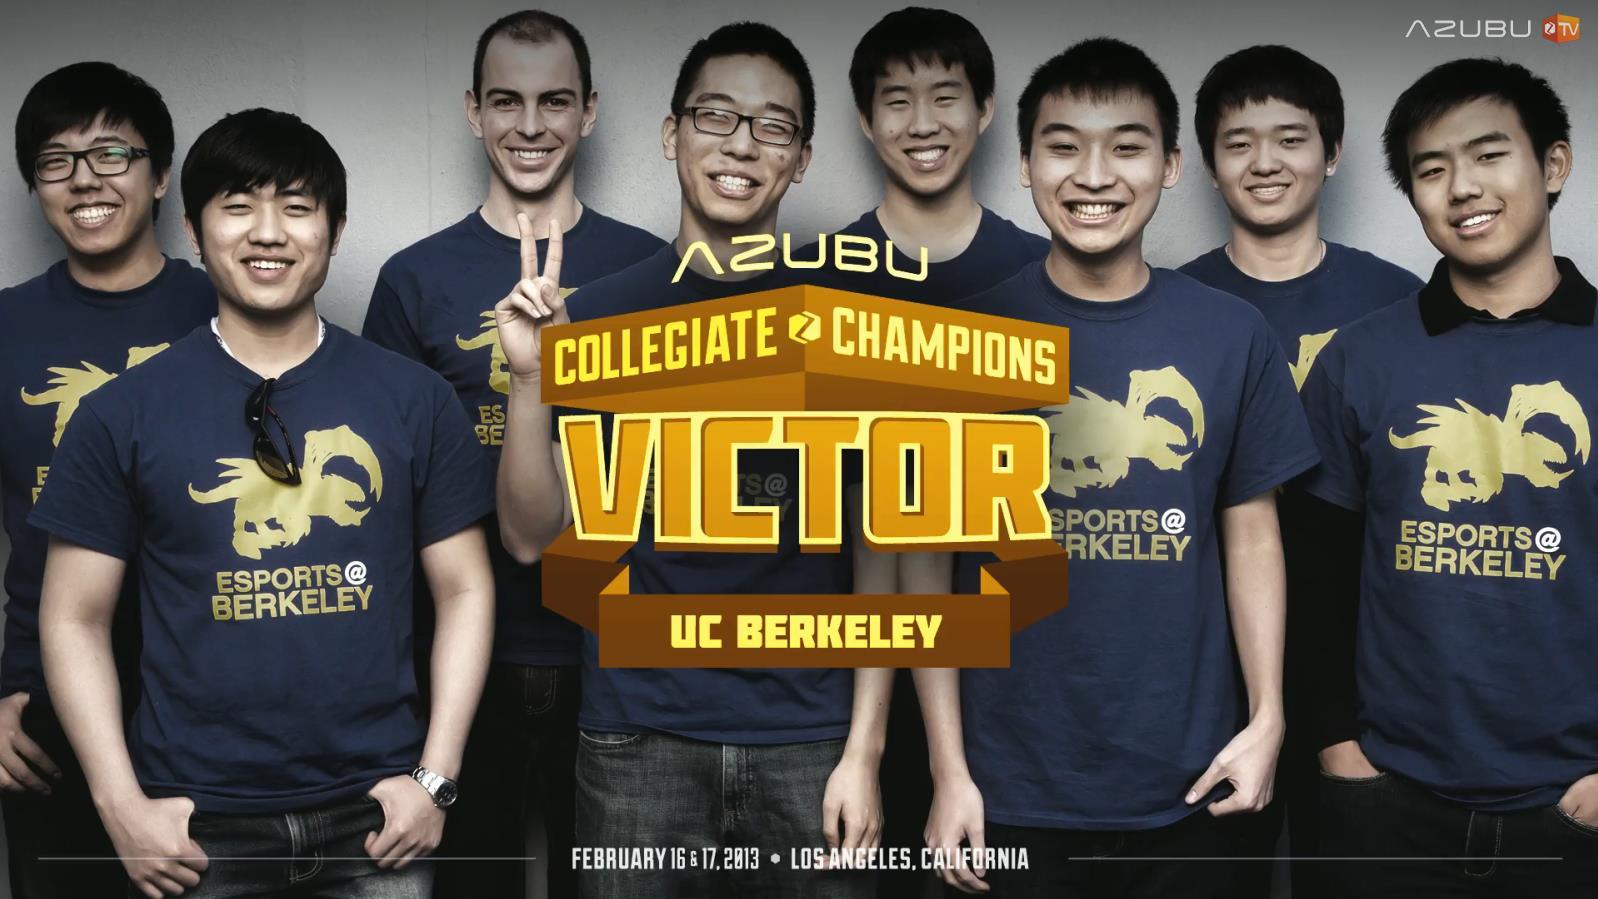 Custom T-Shirts for E Sports At Berkeley Csl Champions - Shirt